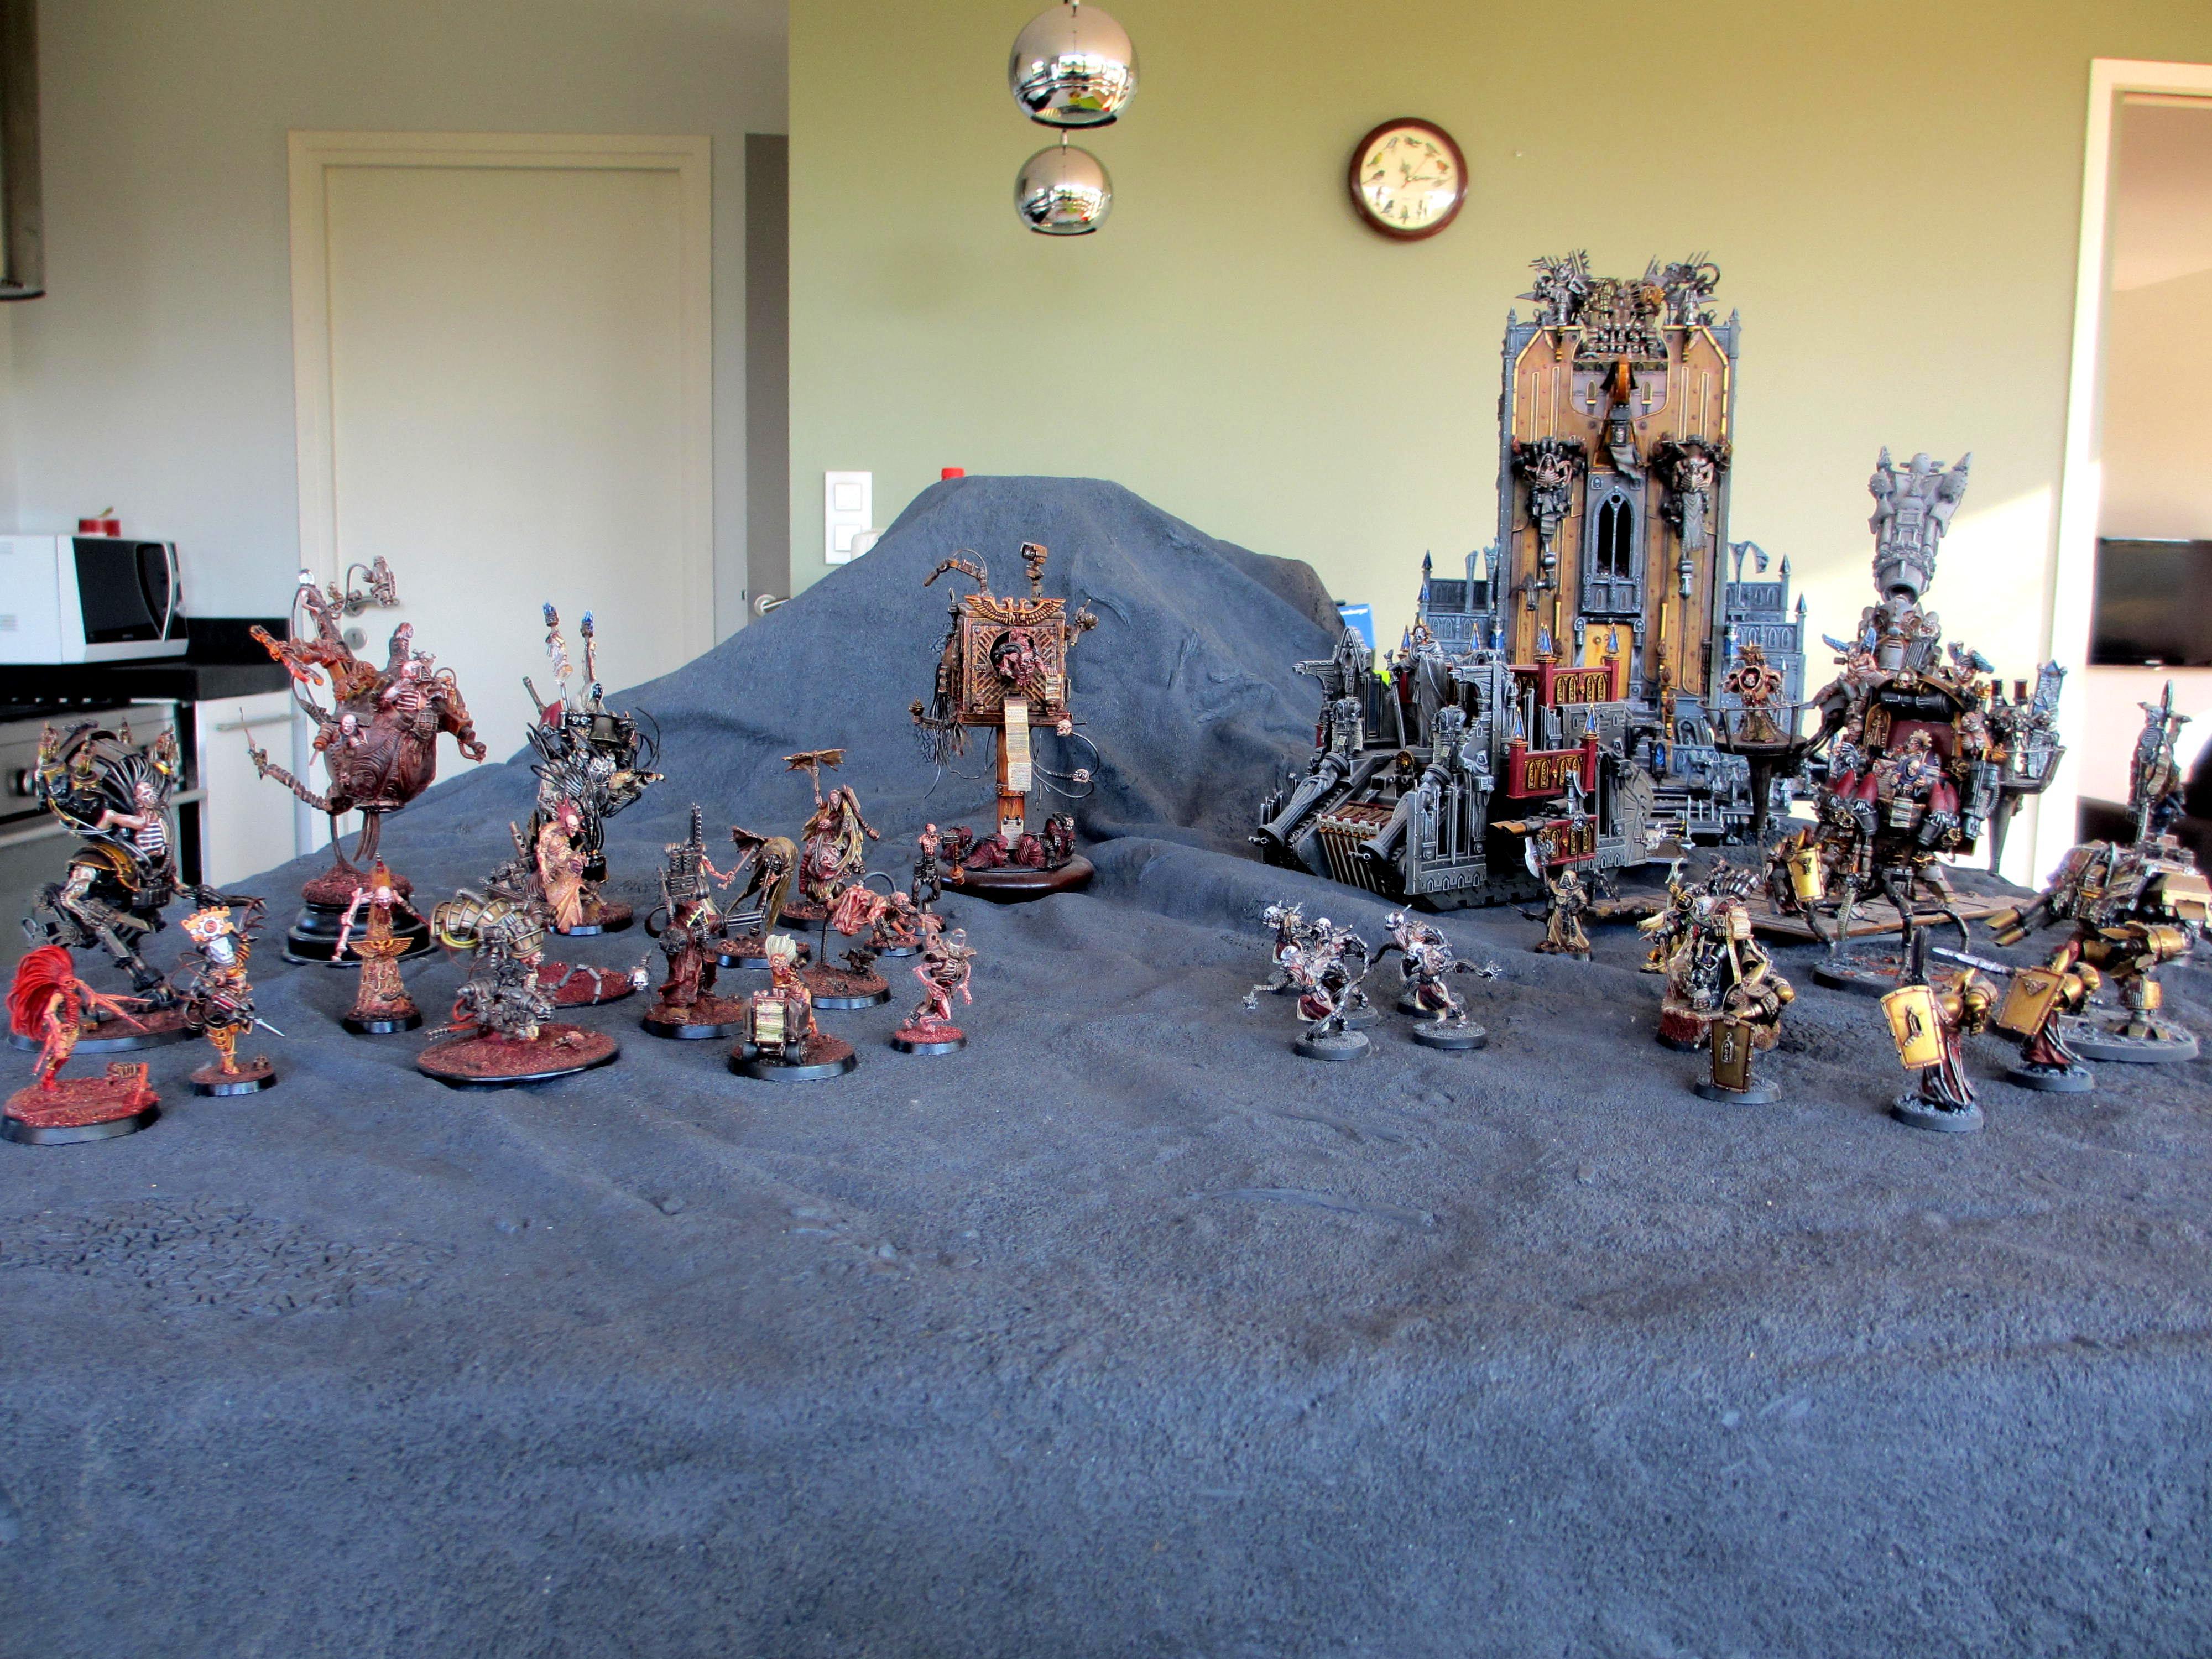 Deimos, Emperor, Heresy, Mars, Mechanicus, Meeting, Warhammer 40,000